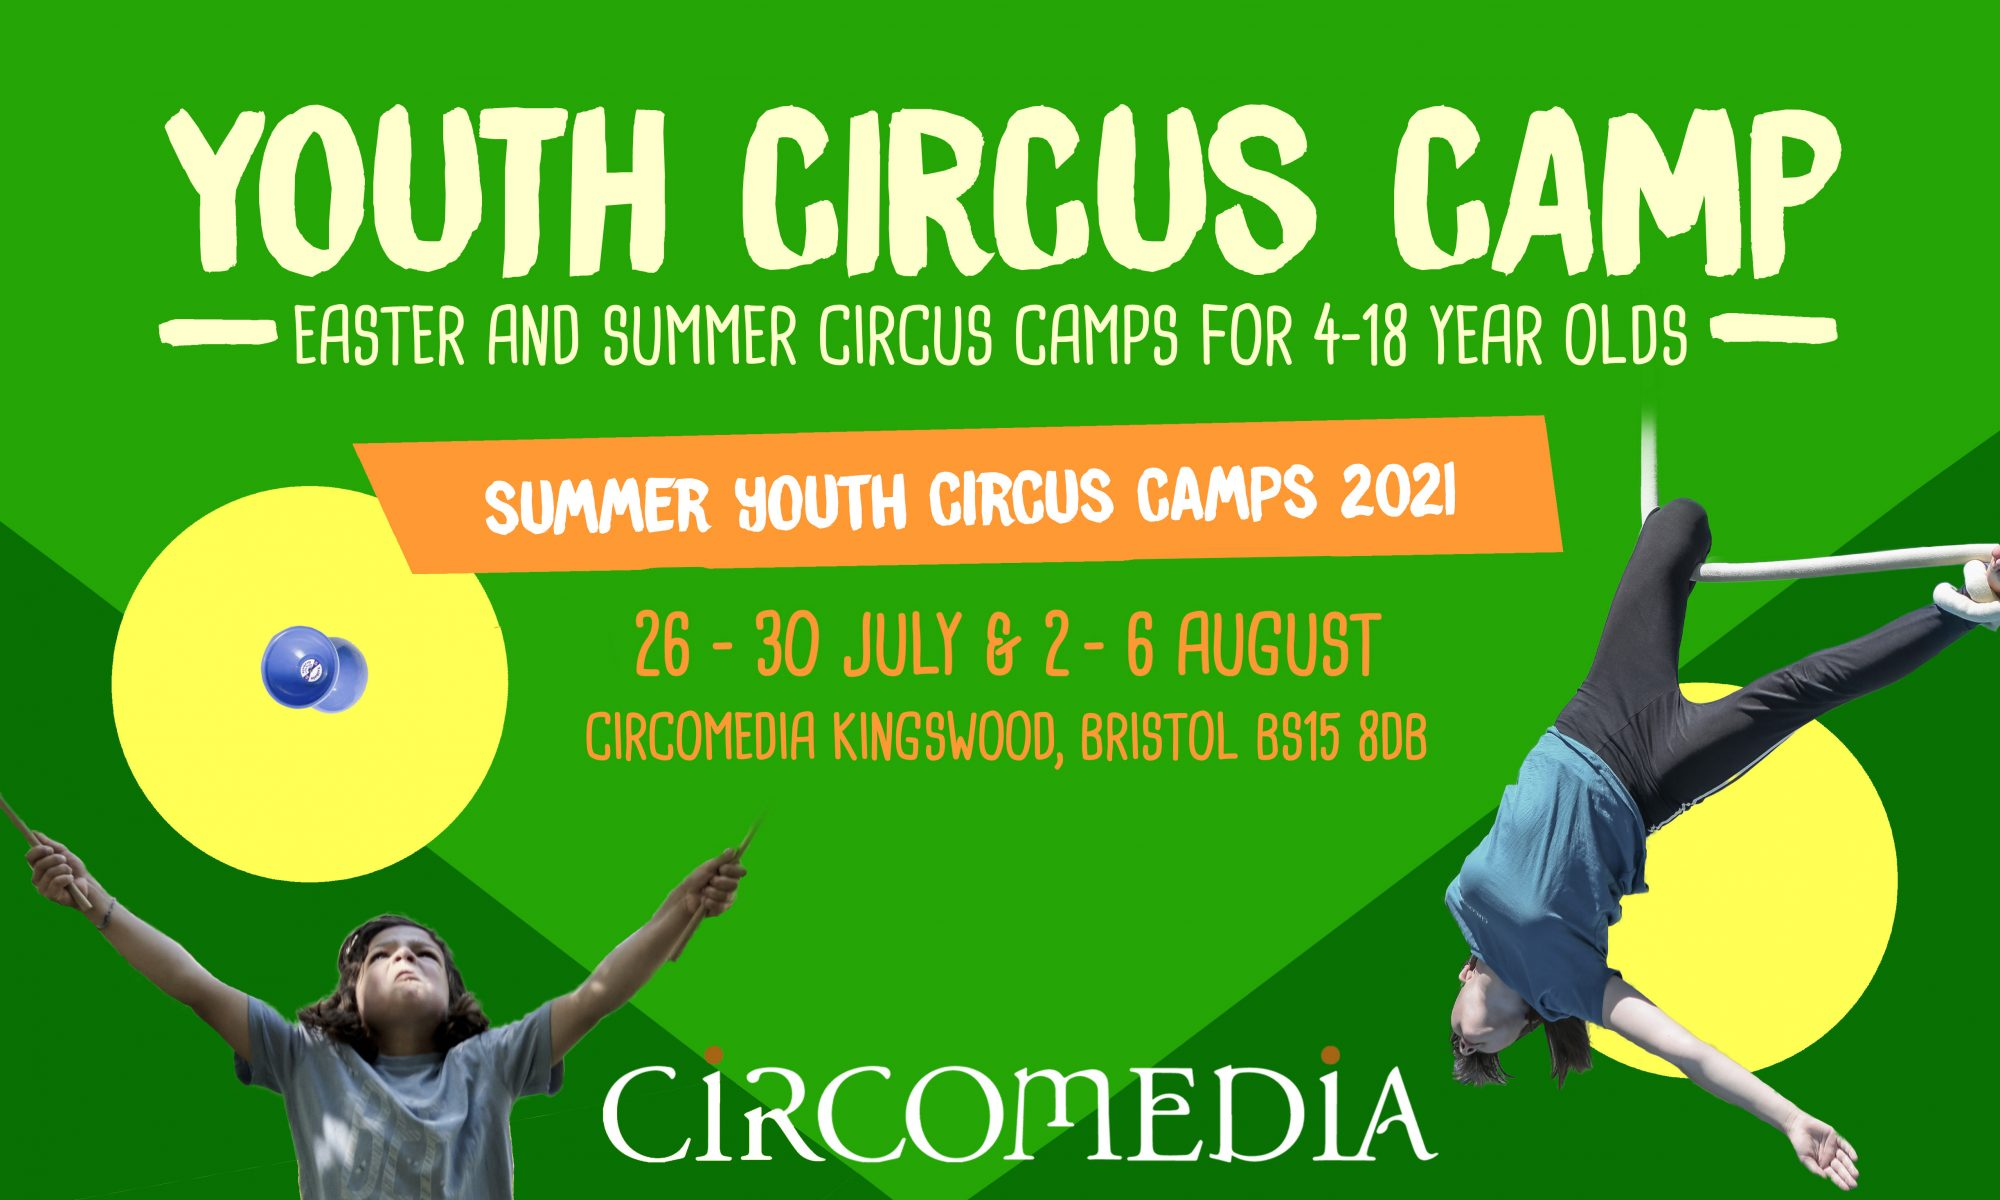 Summer Youth Circus Camp 2021